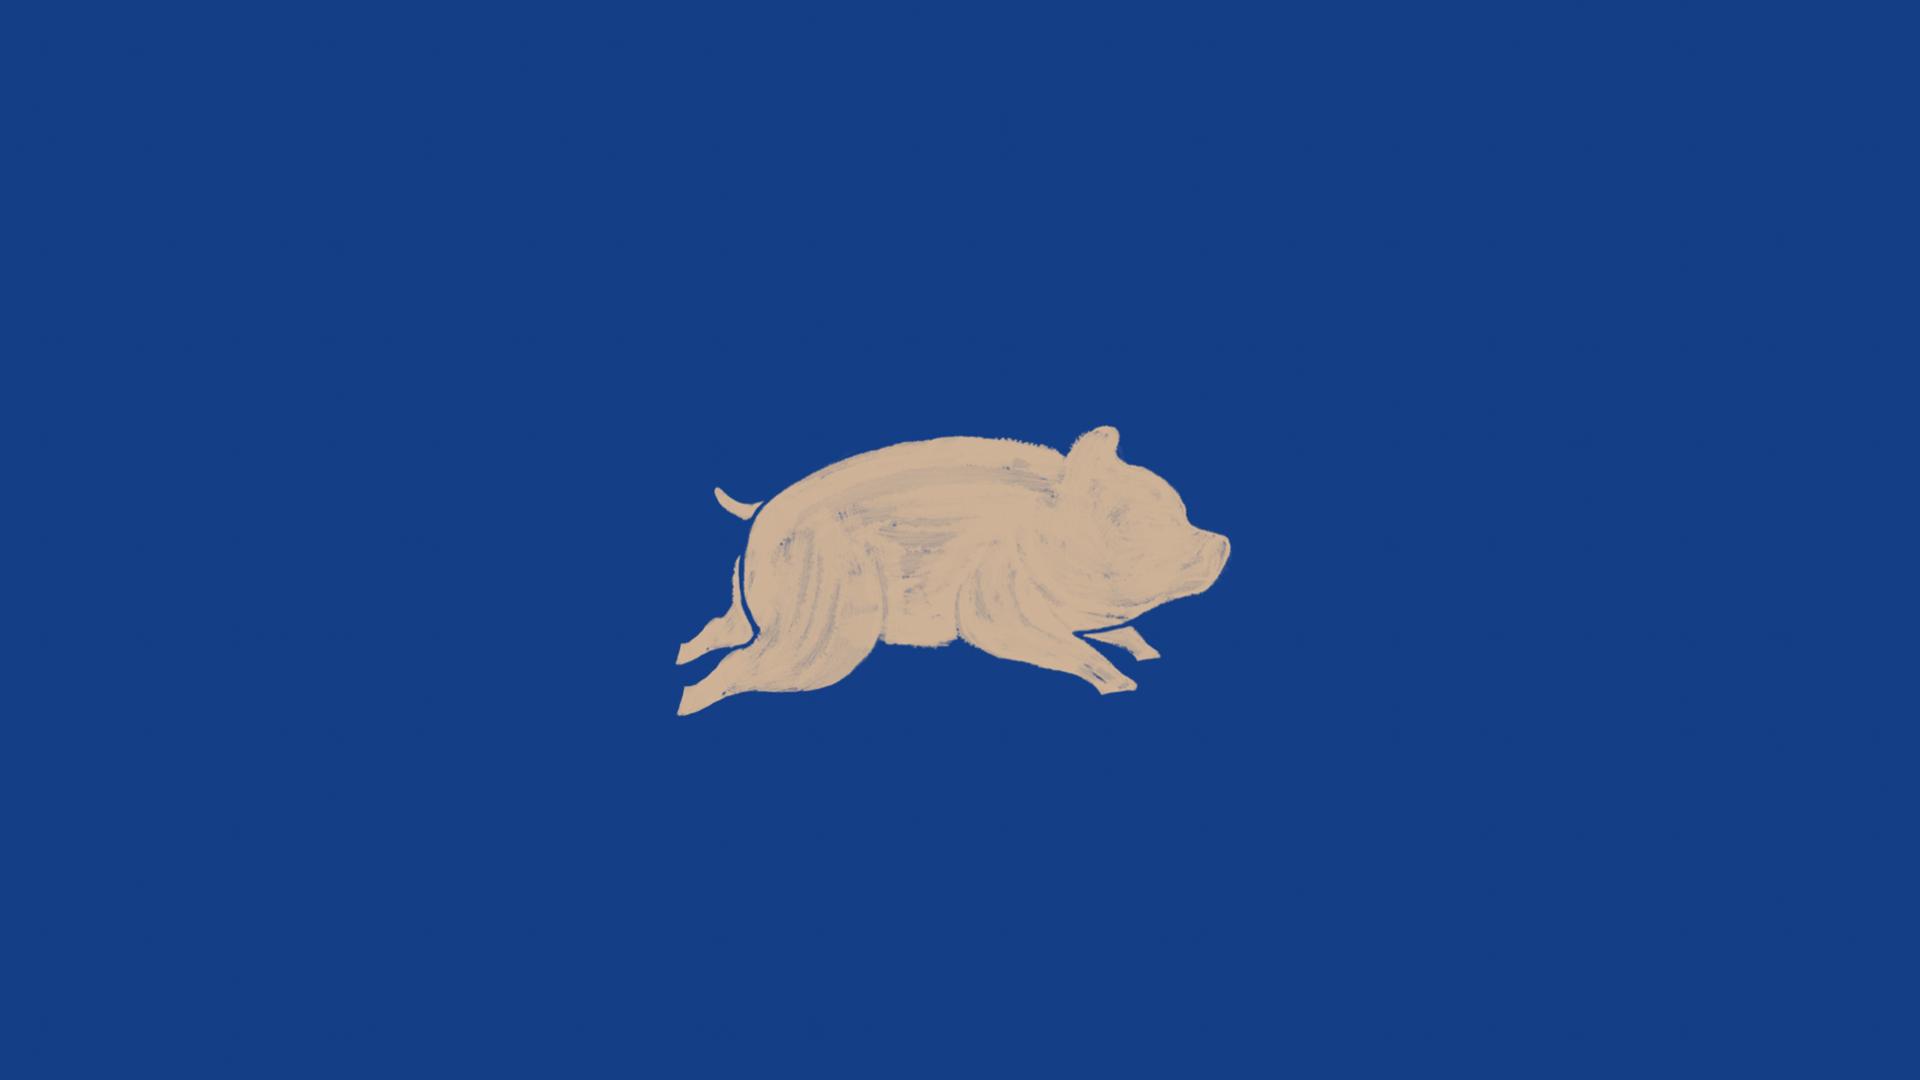 pig-blue-blake-yoenpaperland